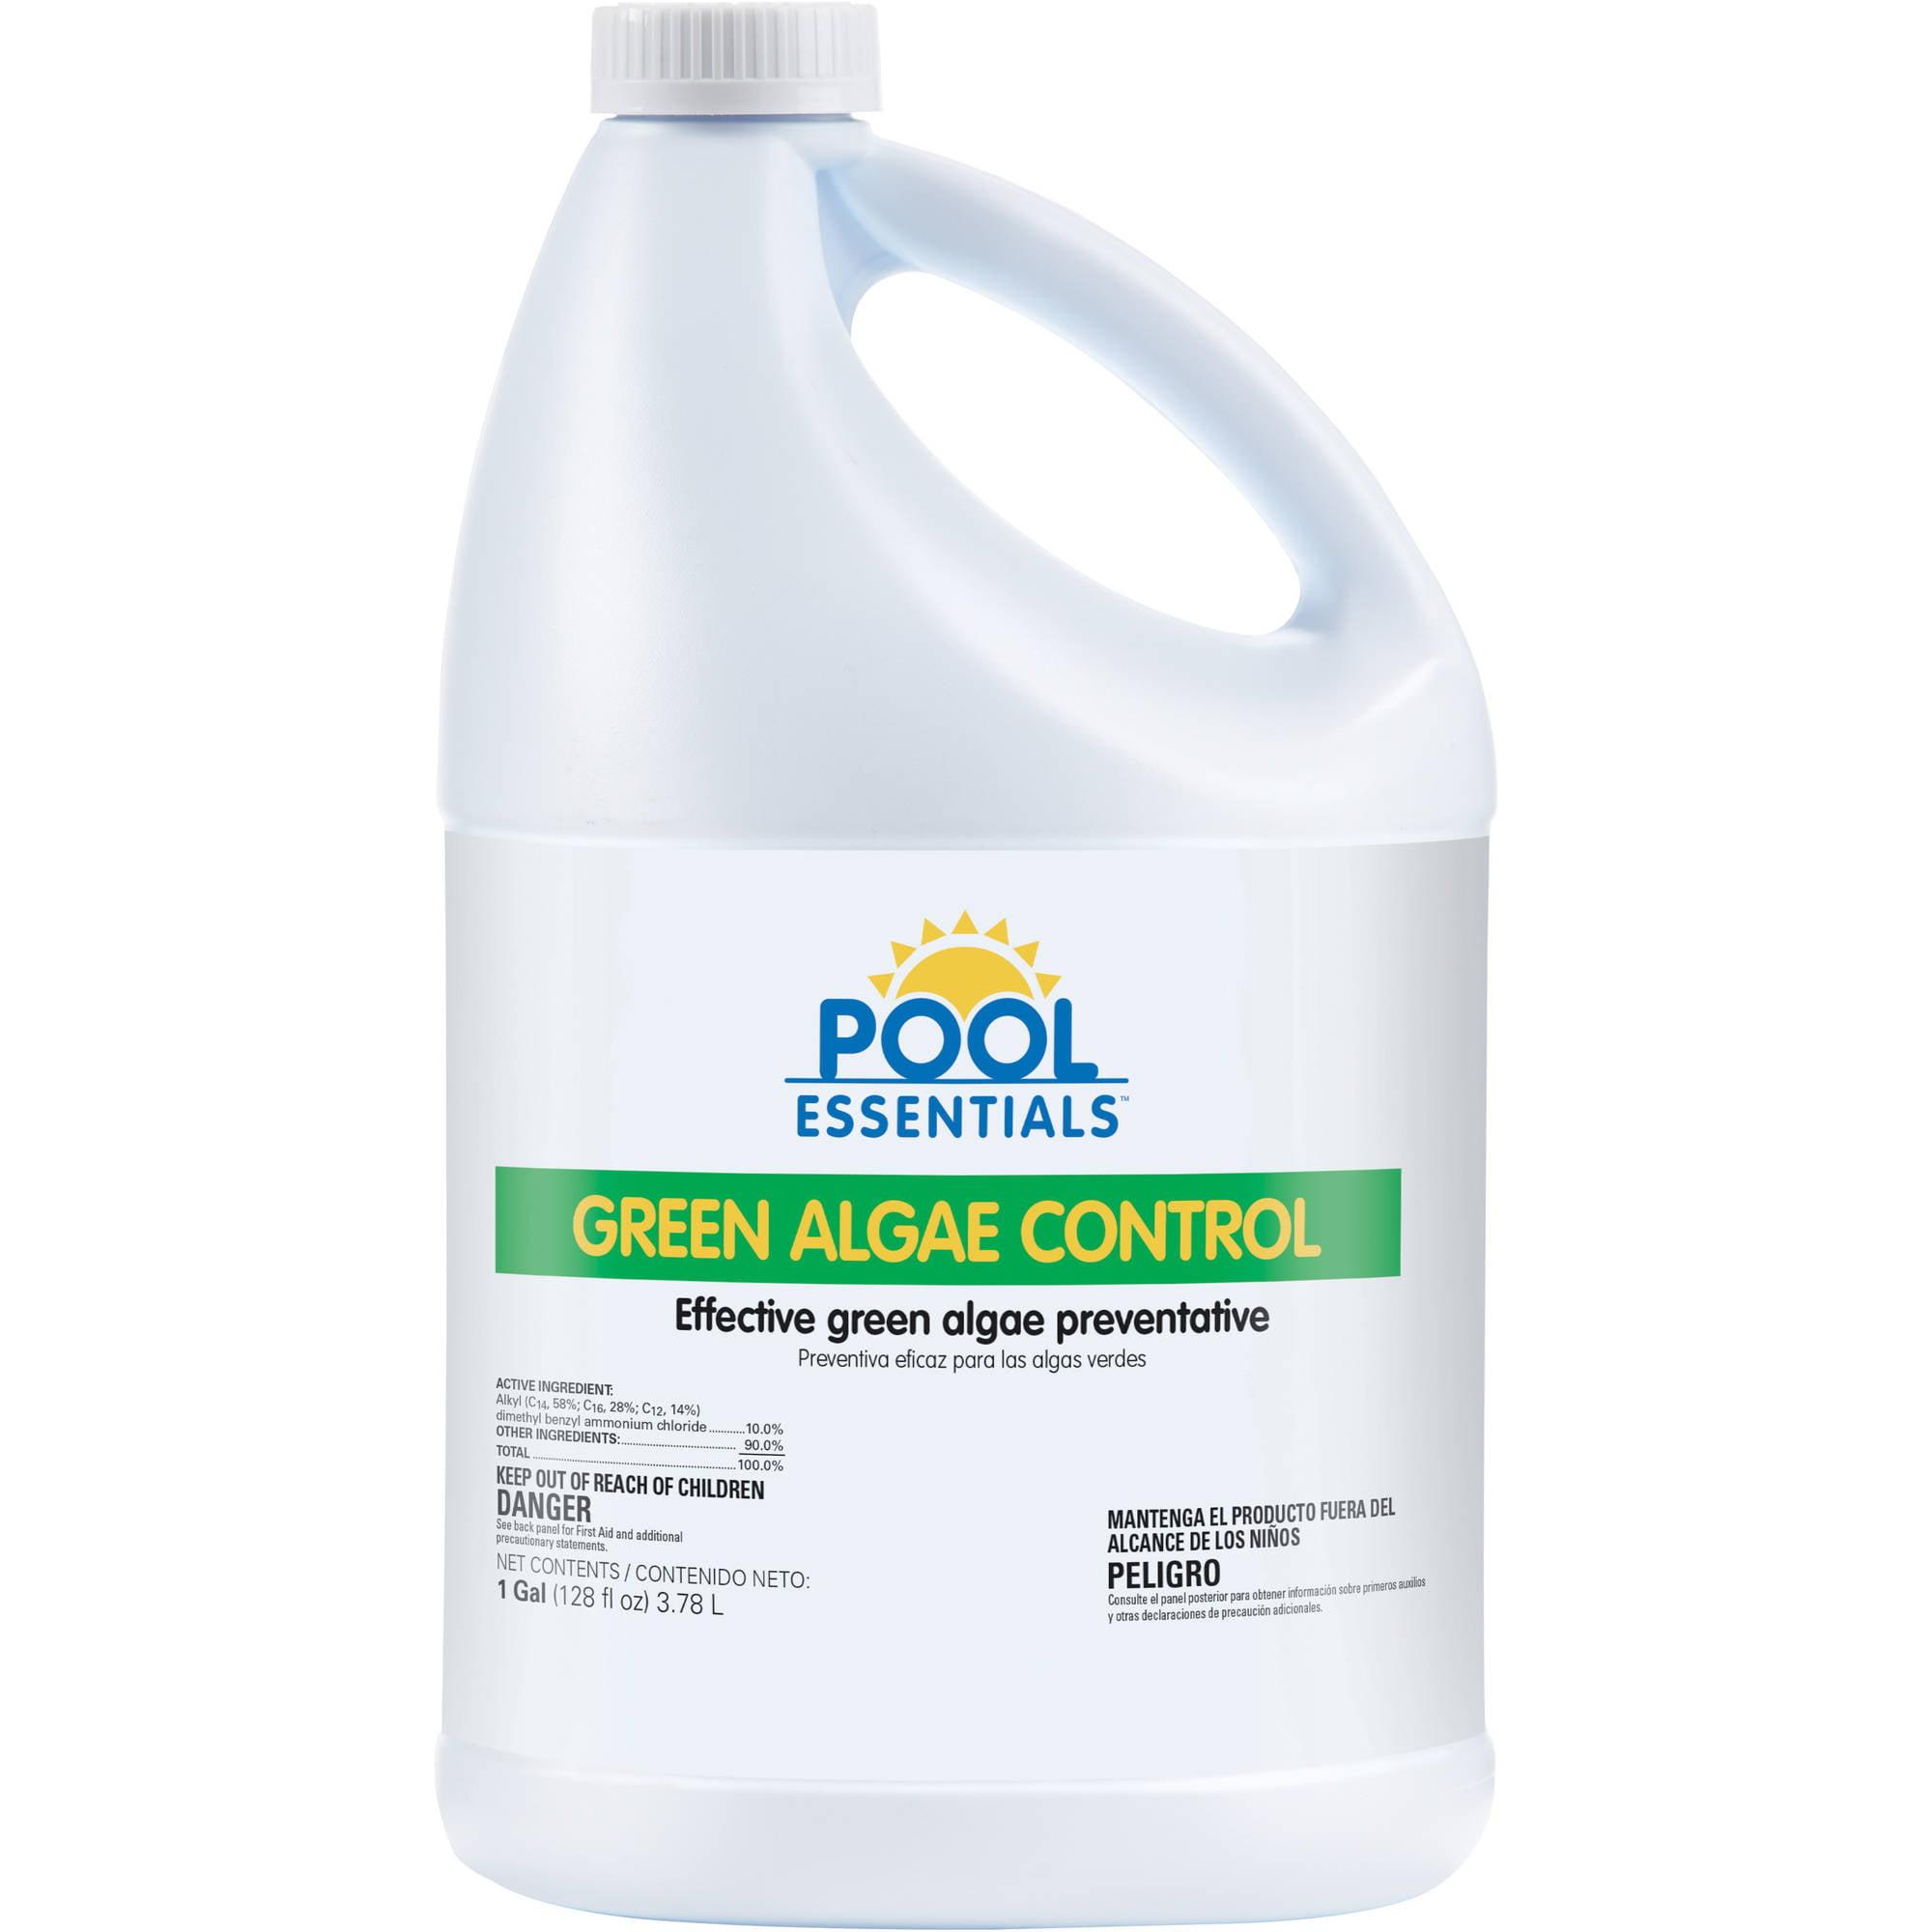 Pool Essentials Pe 4x1 Ga Green Alg Cntrl